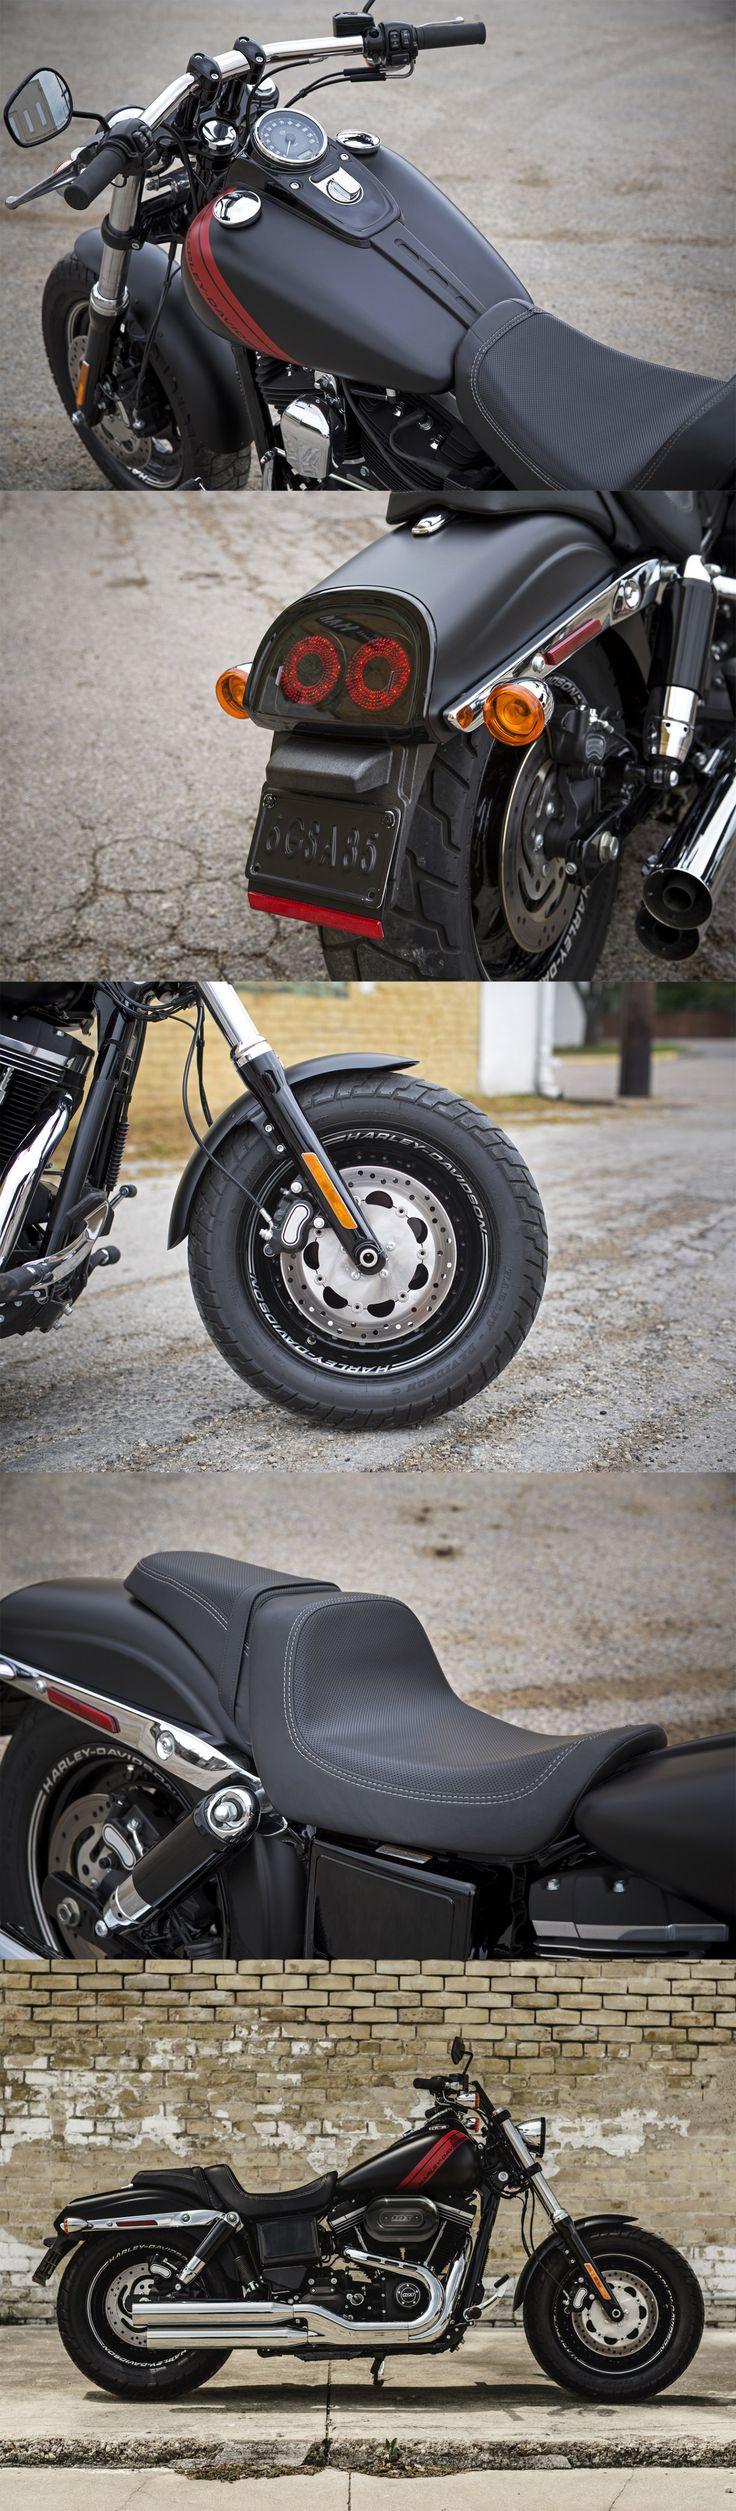 It's big, it's bold and it knows how to make an entrance. | 2016 Harley-Davidson #DarkCustom Fat Bob